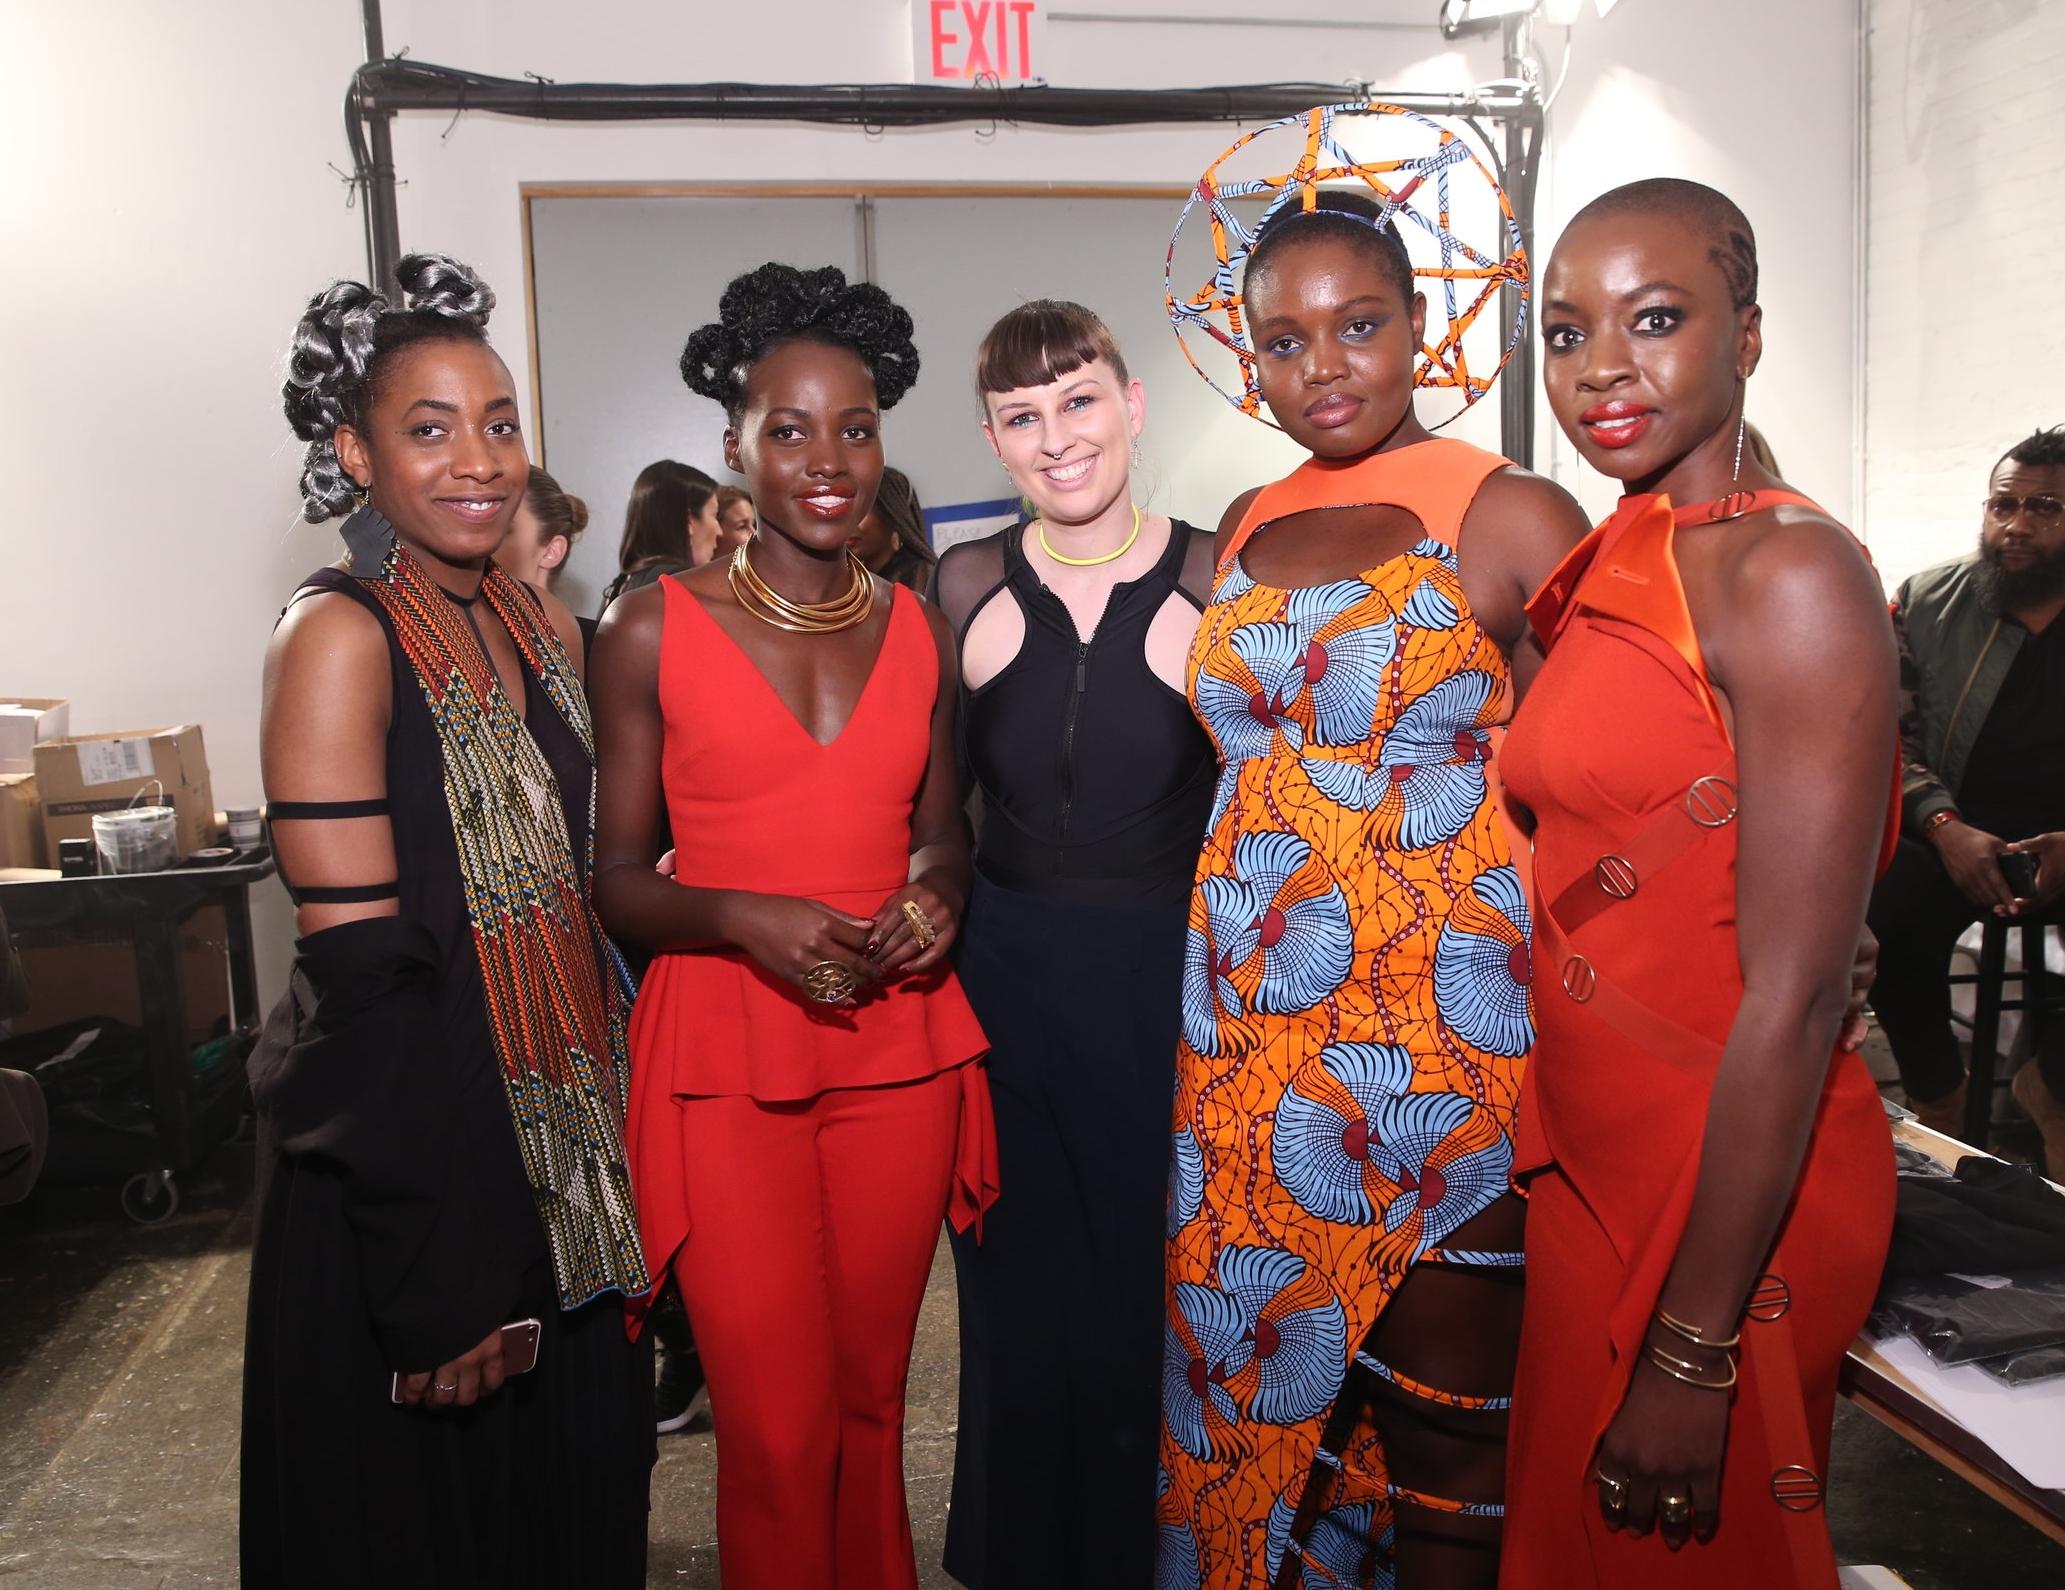 Pictured: Tolu Aremu, Lupita Nyong'o, Becca McCharen-Tran, Tash Ncube, and Danai Gurira.